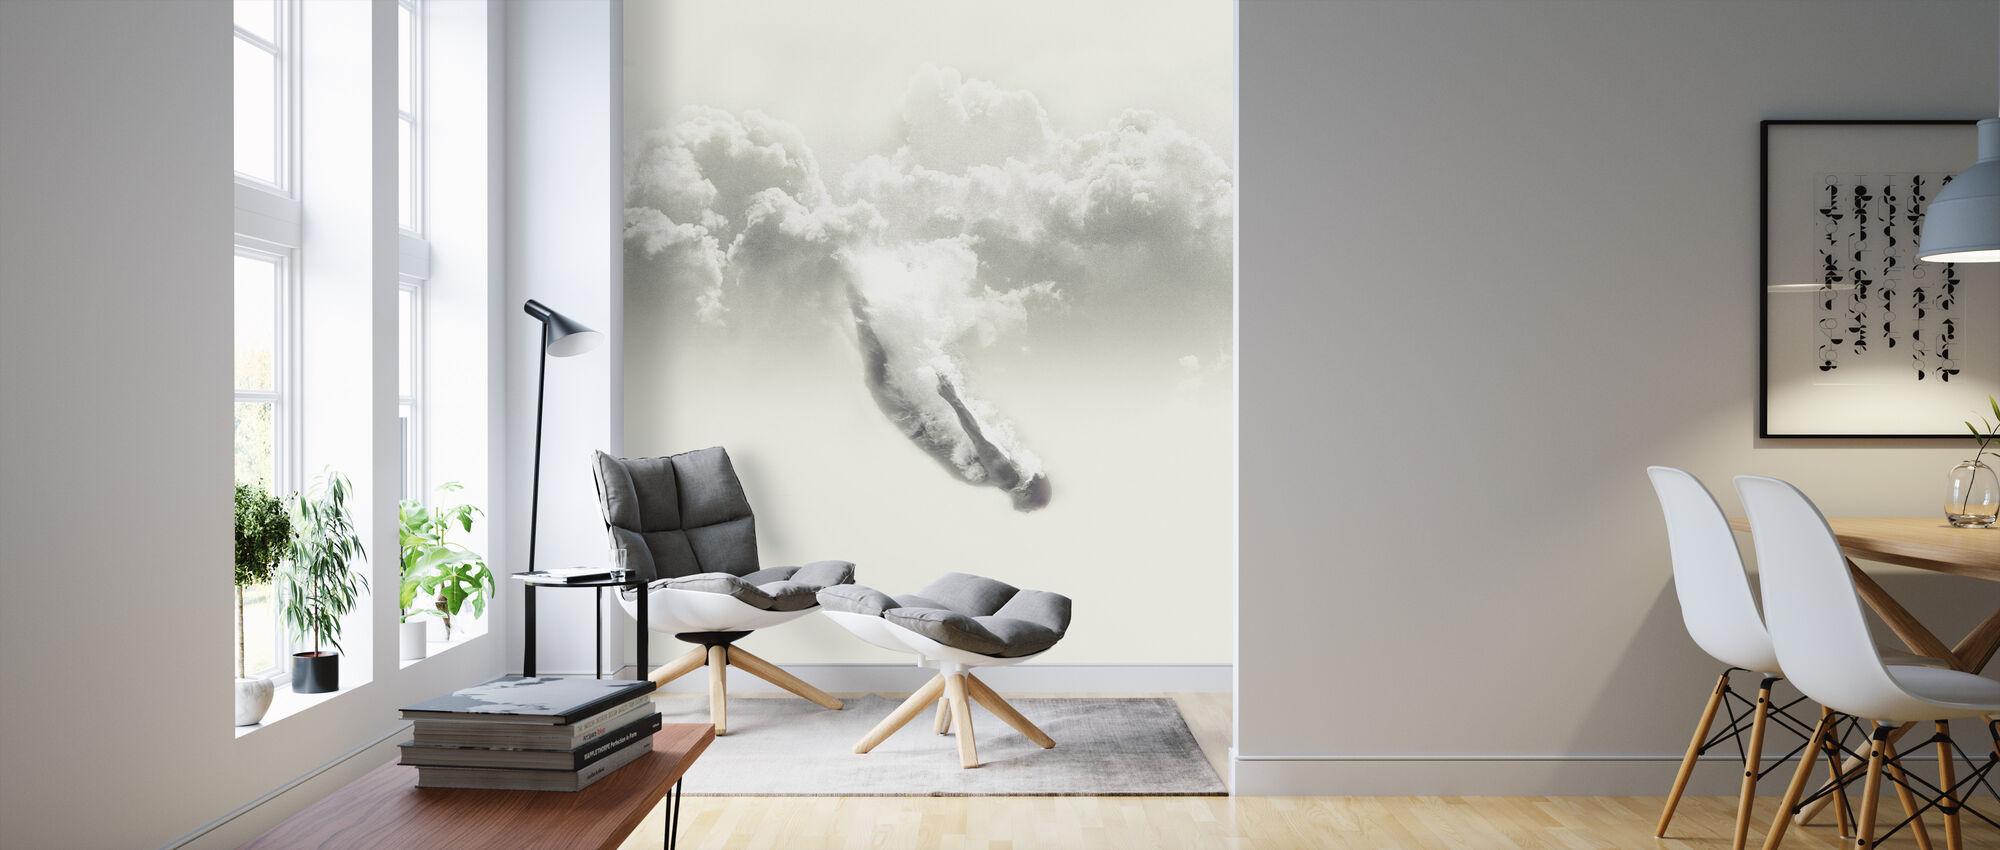 Sky Diver - Wallpaper - Living Room